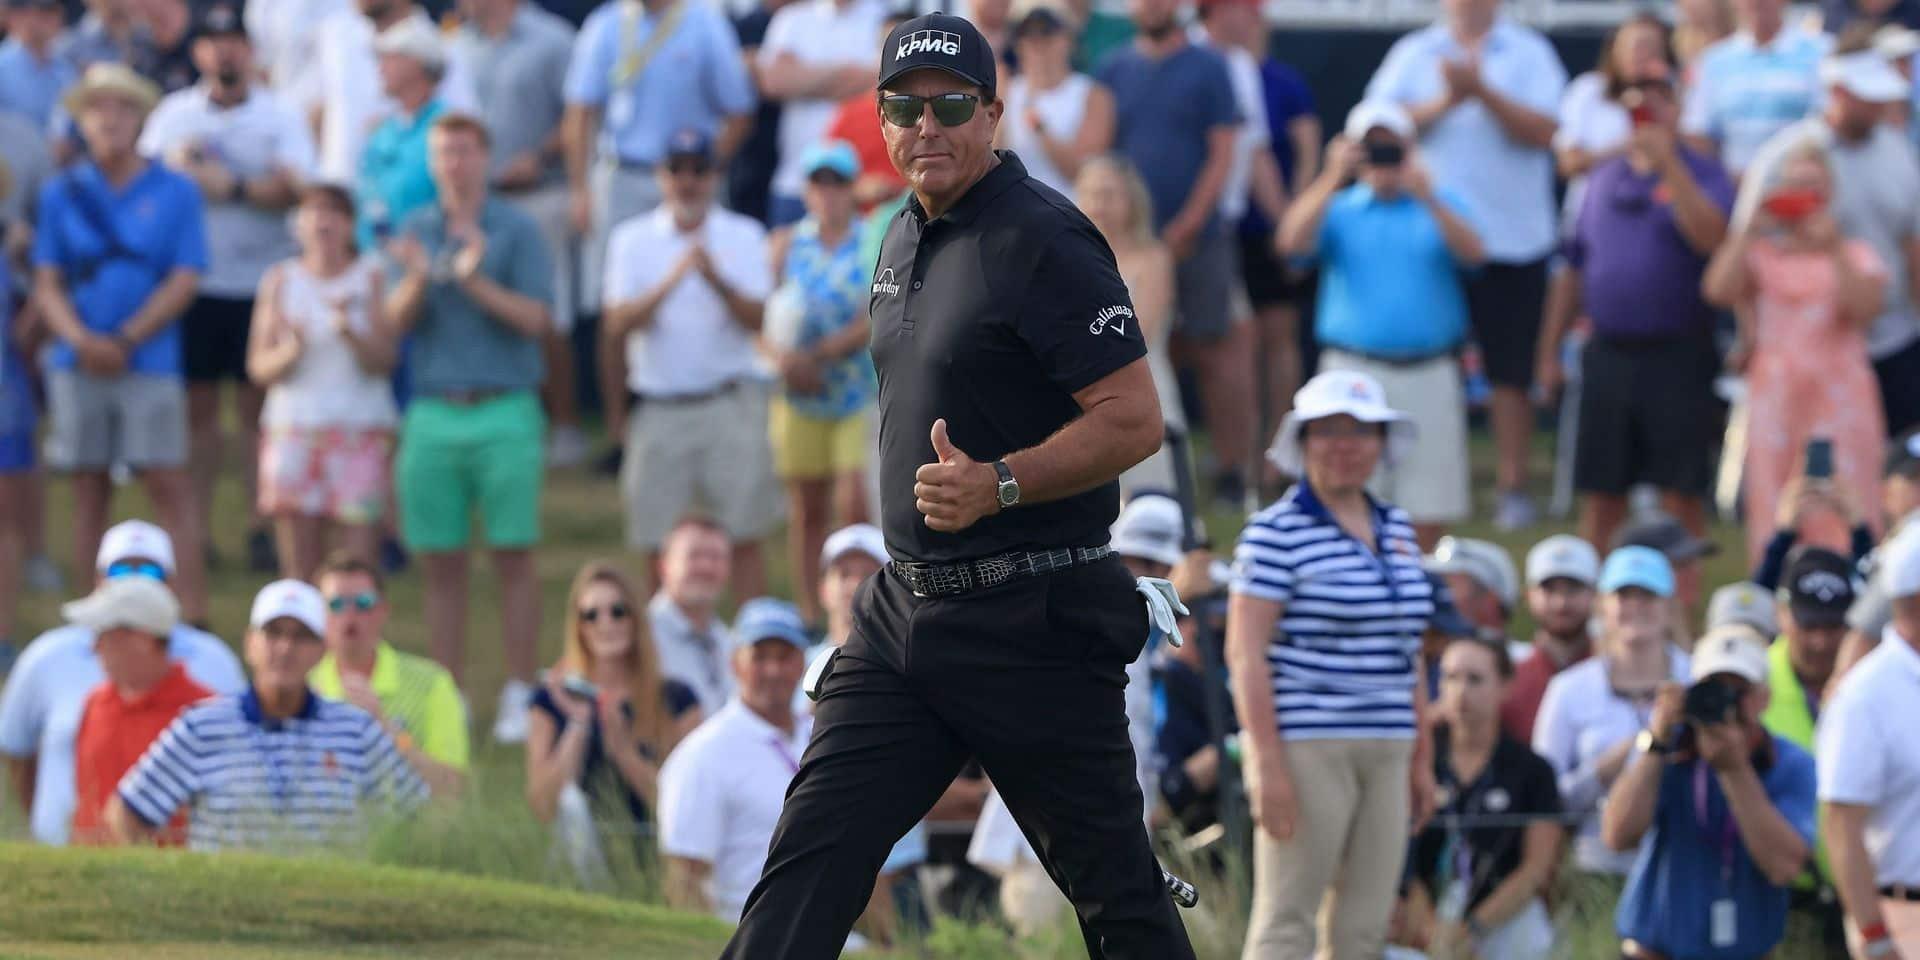 PGA Championship : Mickelson tient bon!